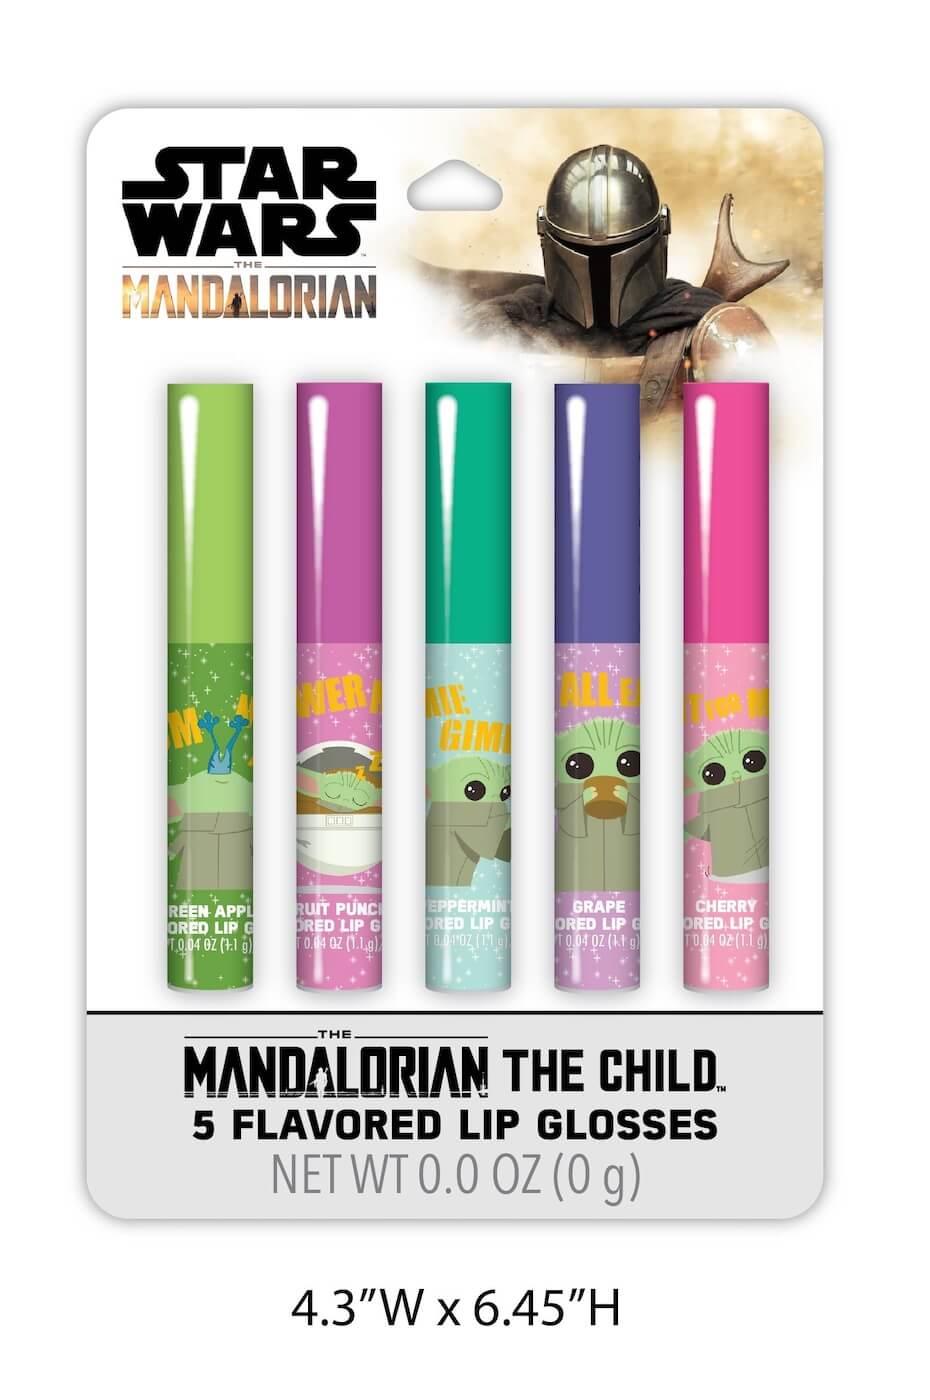 Mandalorian The Child 5 Flavored Lip Glosses